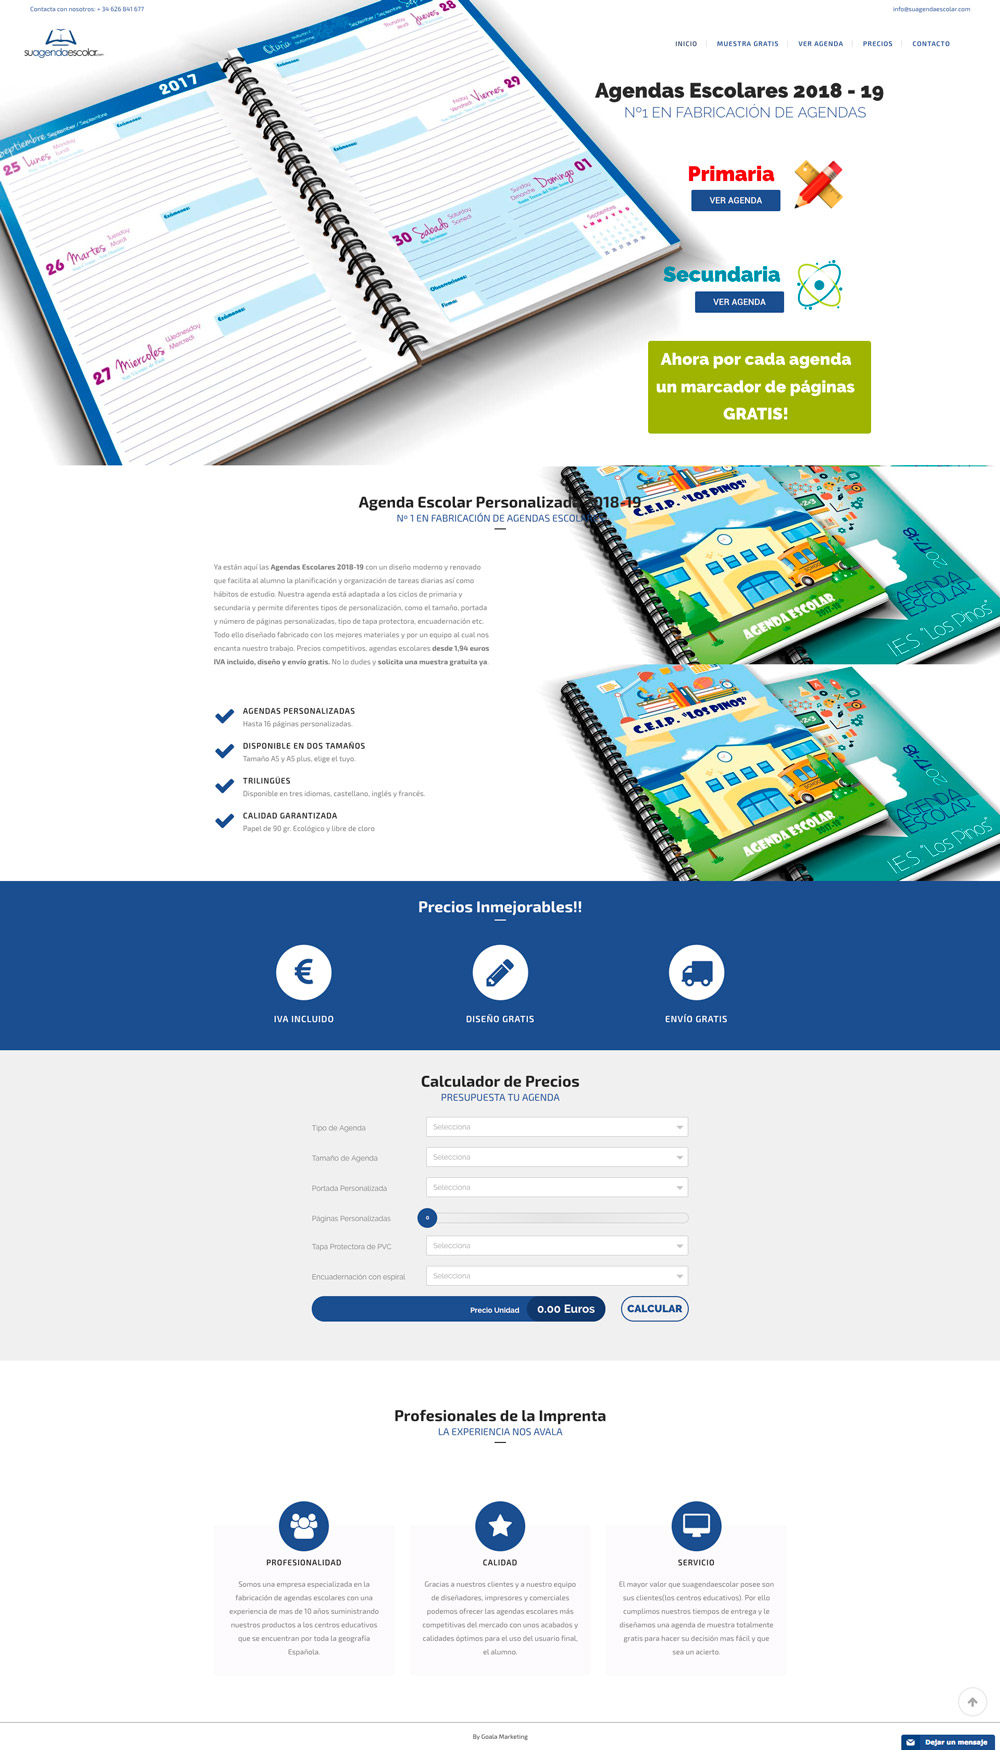 diseño web agendas escolares 2018